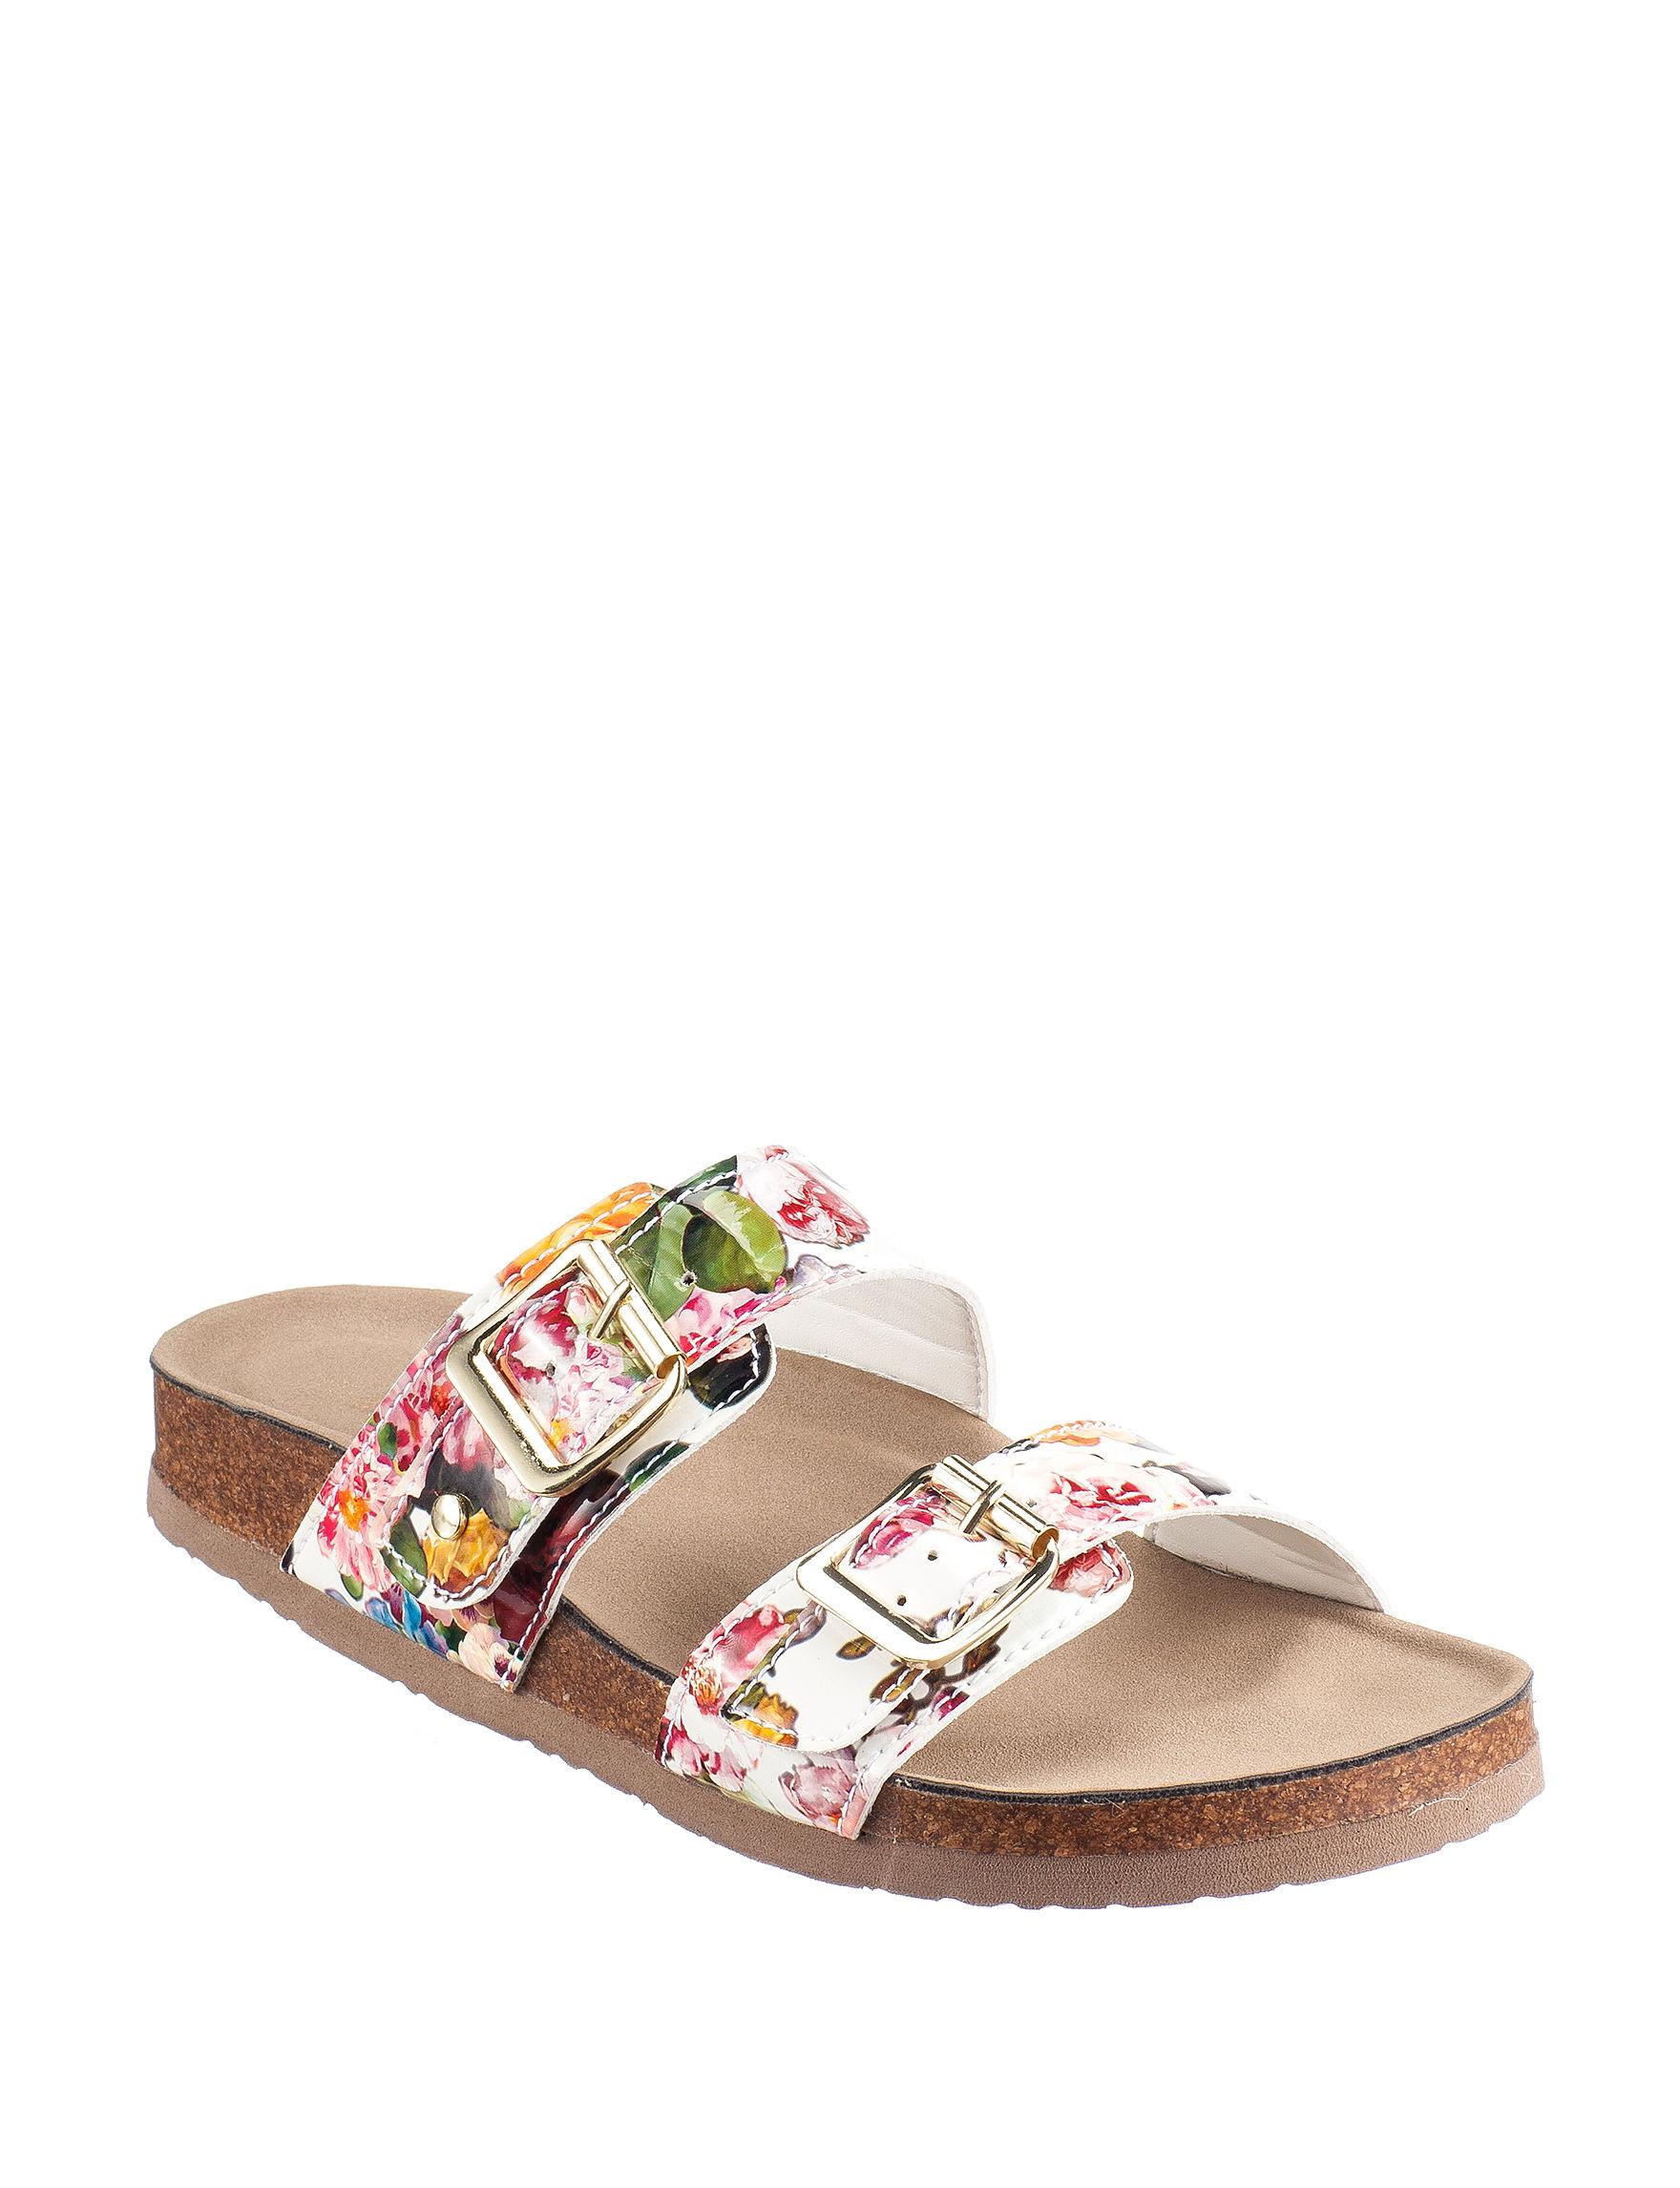 Madden Girl Floral Print Flat Sandals